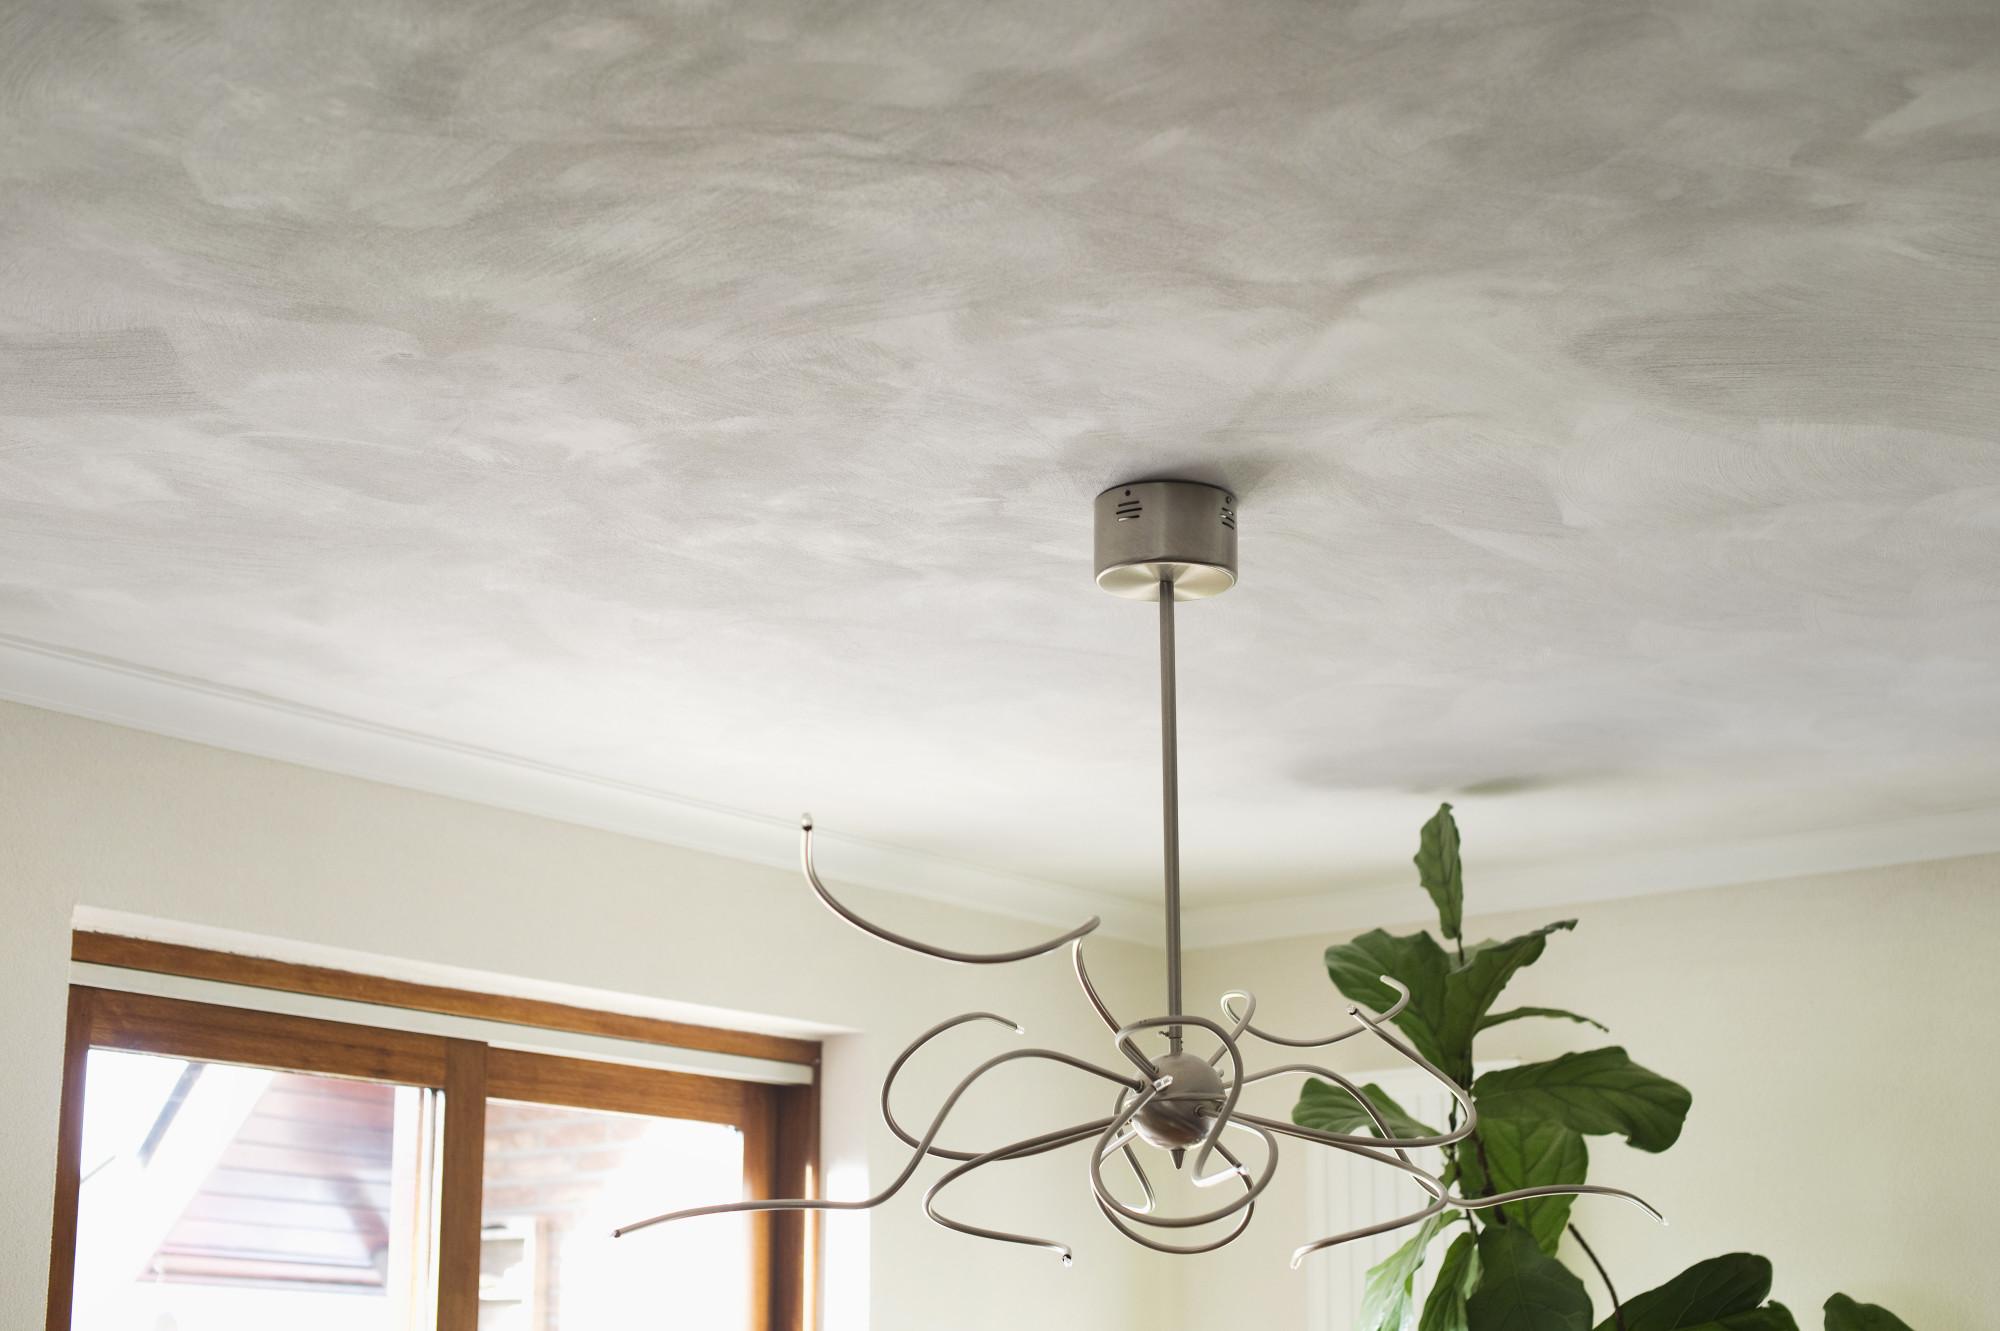 Keuken nobilia rode - Decoratie woonkamer plafond ...